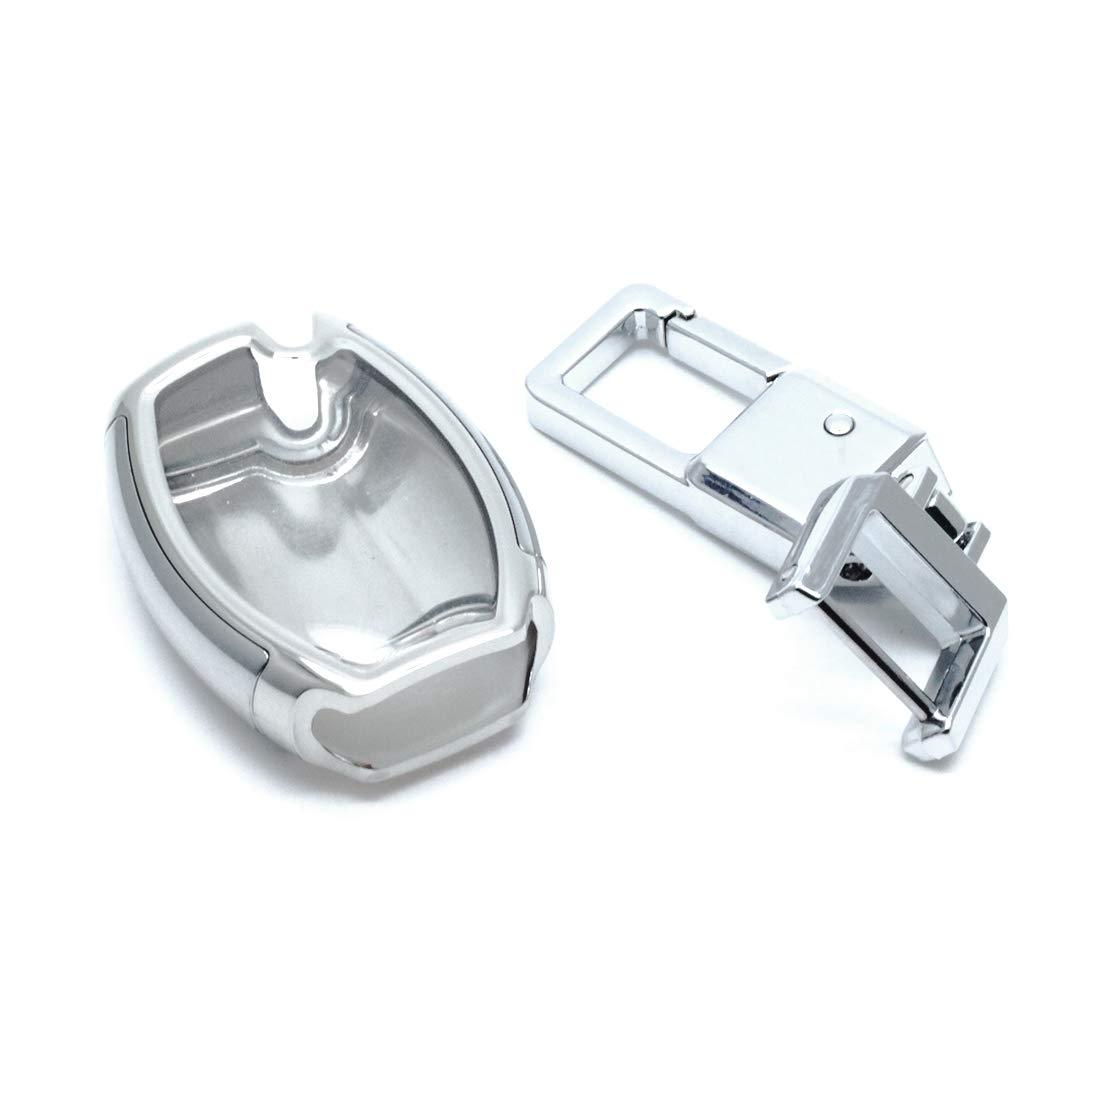 Key Fob Case for Mercedes Benz C Class E Class Premium Soft TPU Anti-dust Full Protection Silver with Key Chain AUTUT Mercedes Benz Key Fob Cover